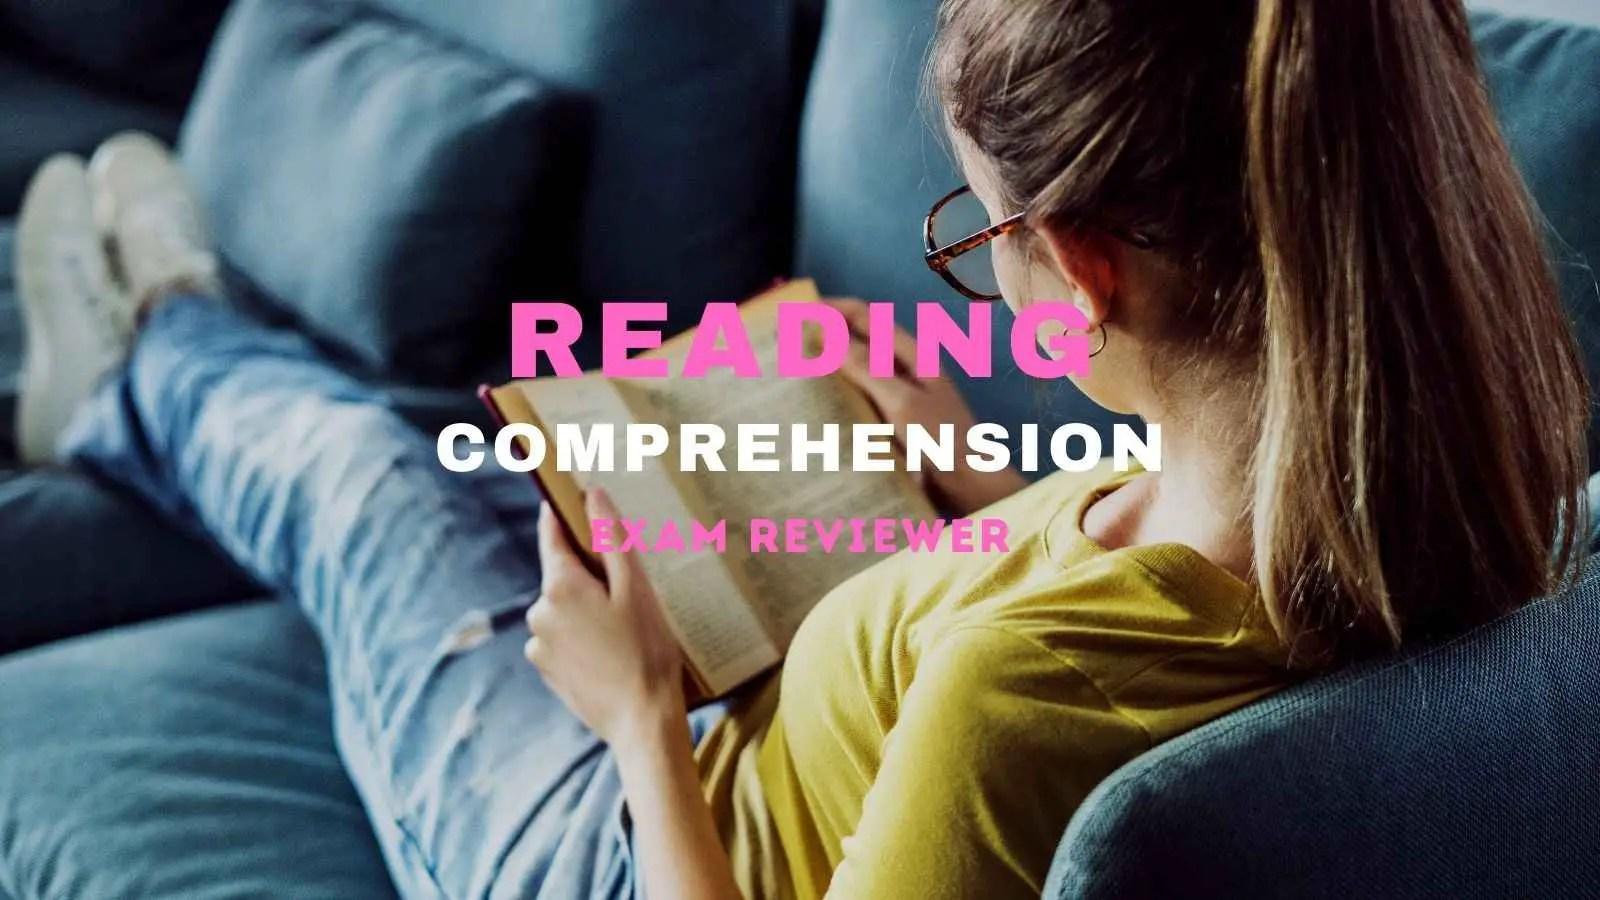 reading comprehension civil service exam philippines